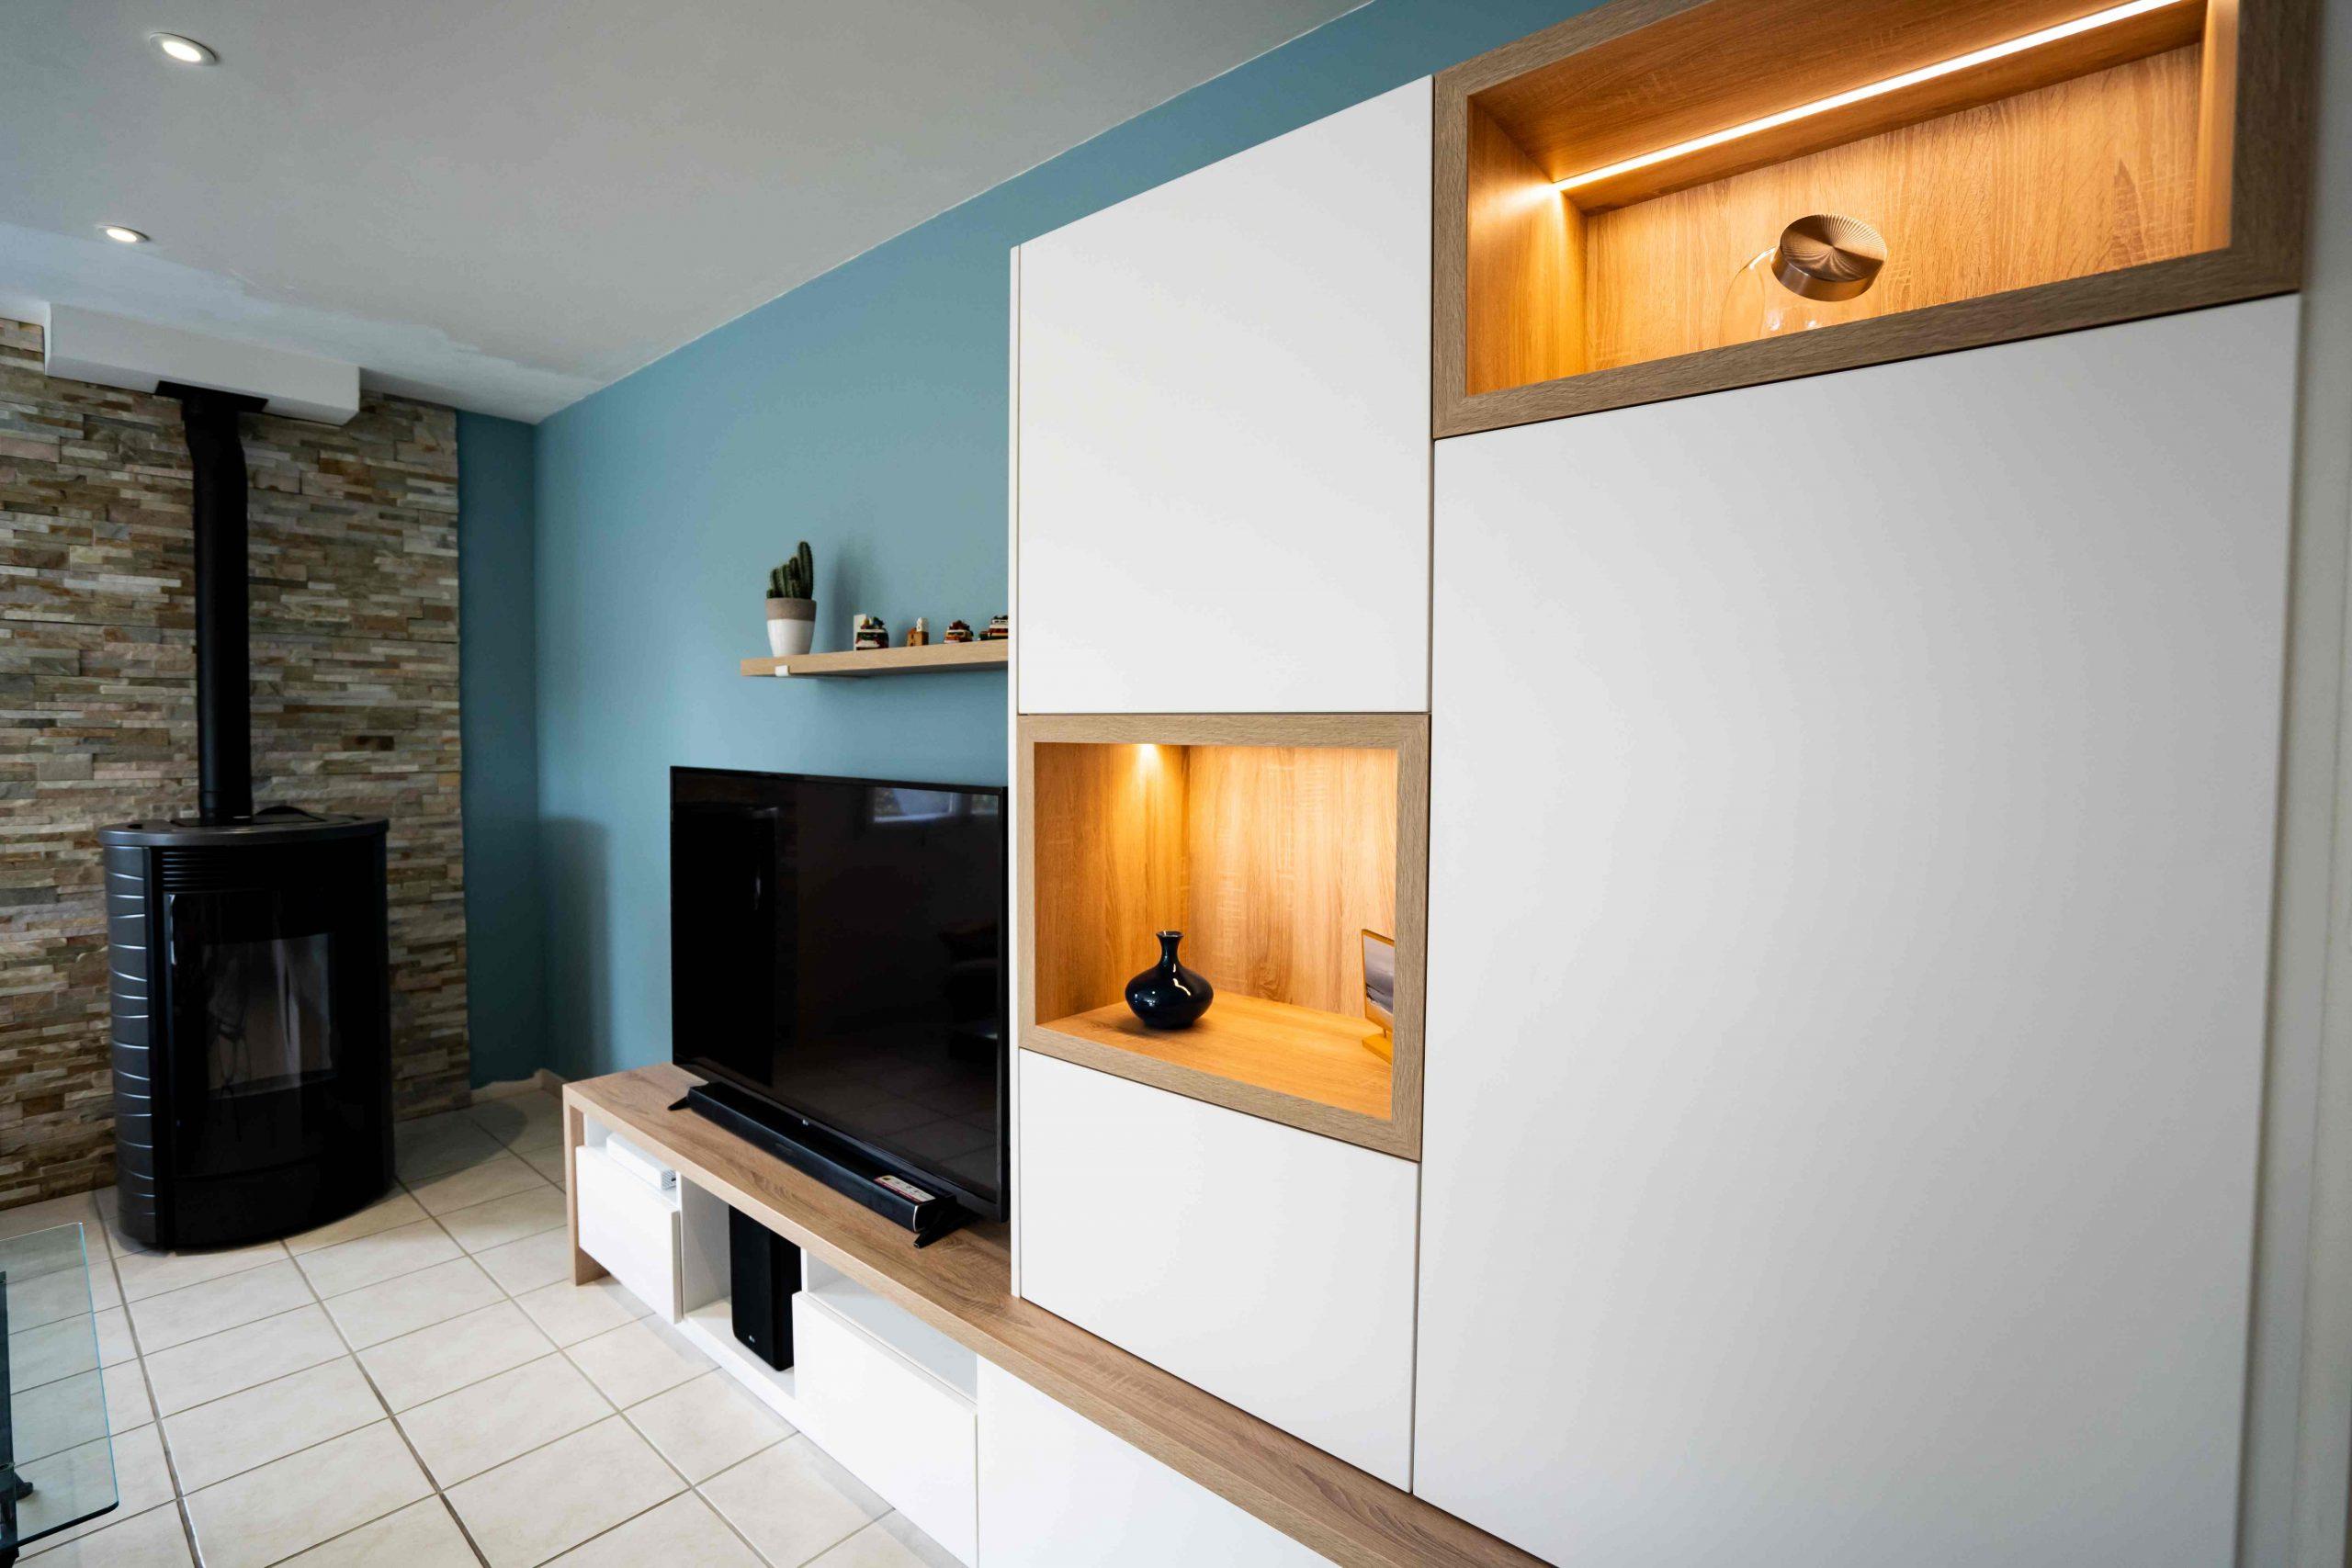 RDI01385 scaled - Meuble TV sur mesure blanc & chêne